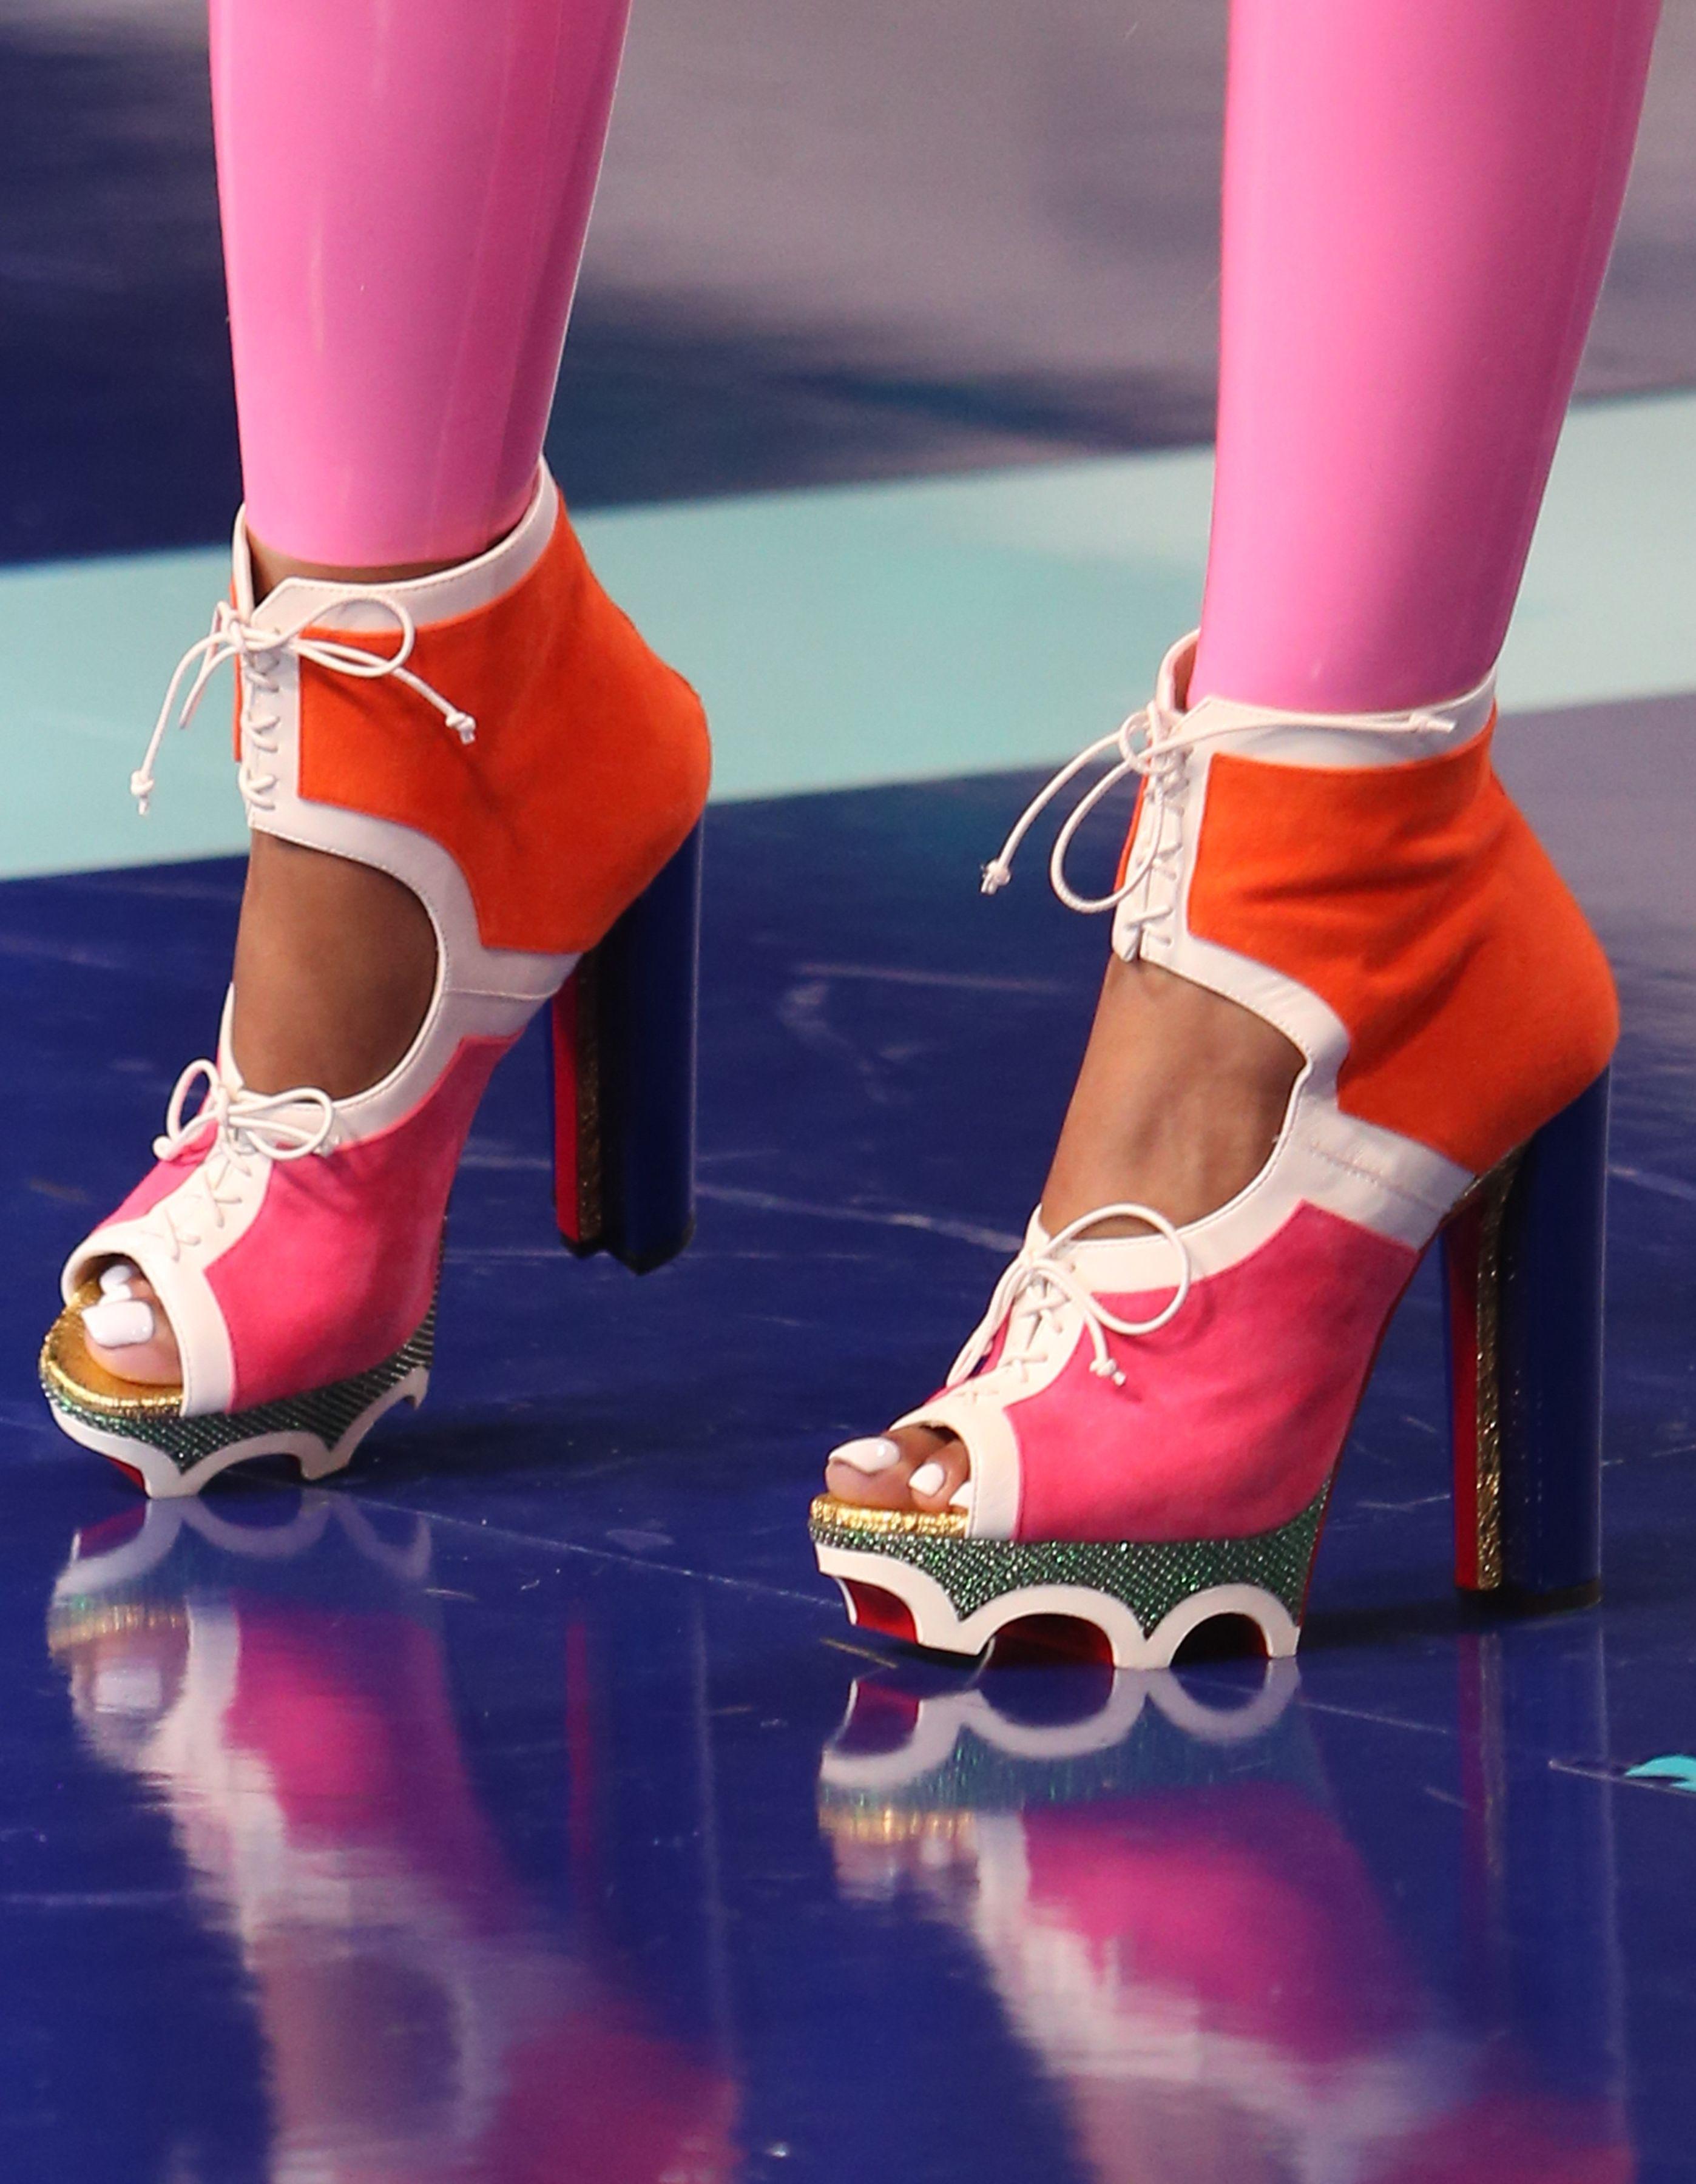 292fe1fbac4 Nicki Minaj Shocks in Christian Louboutin  Lolacrampon  Booties and  1  Million Worth of Diamonds